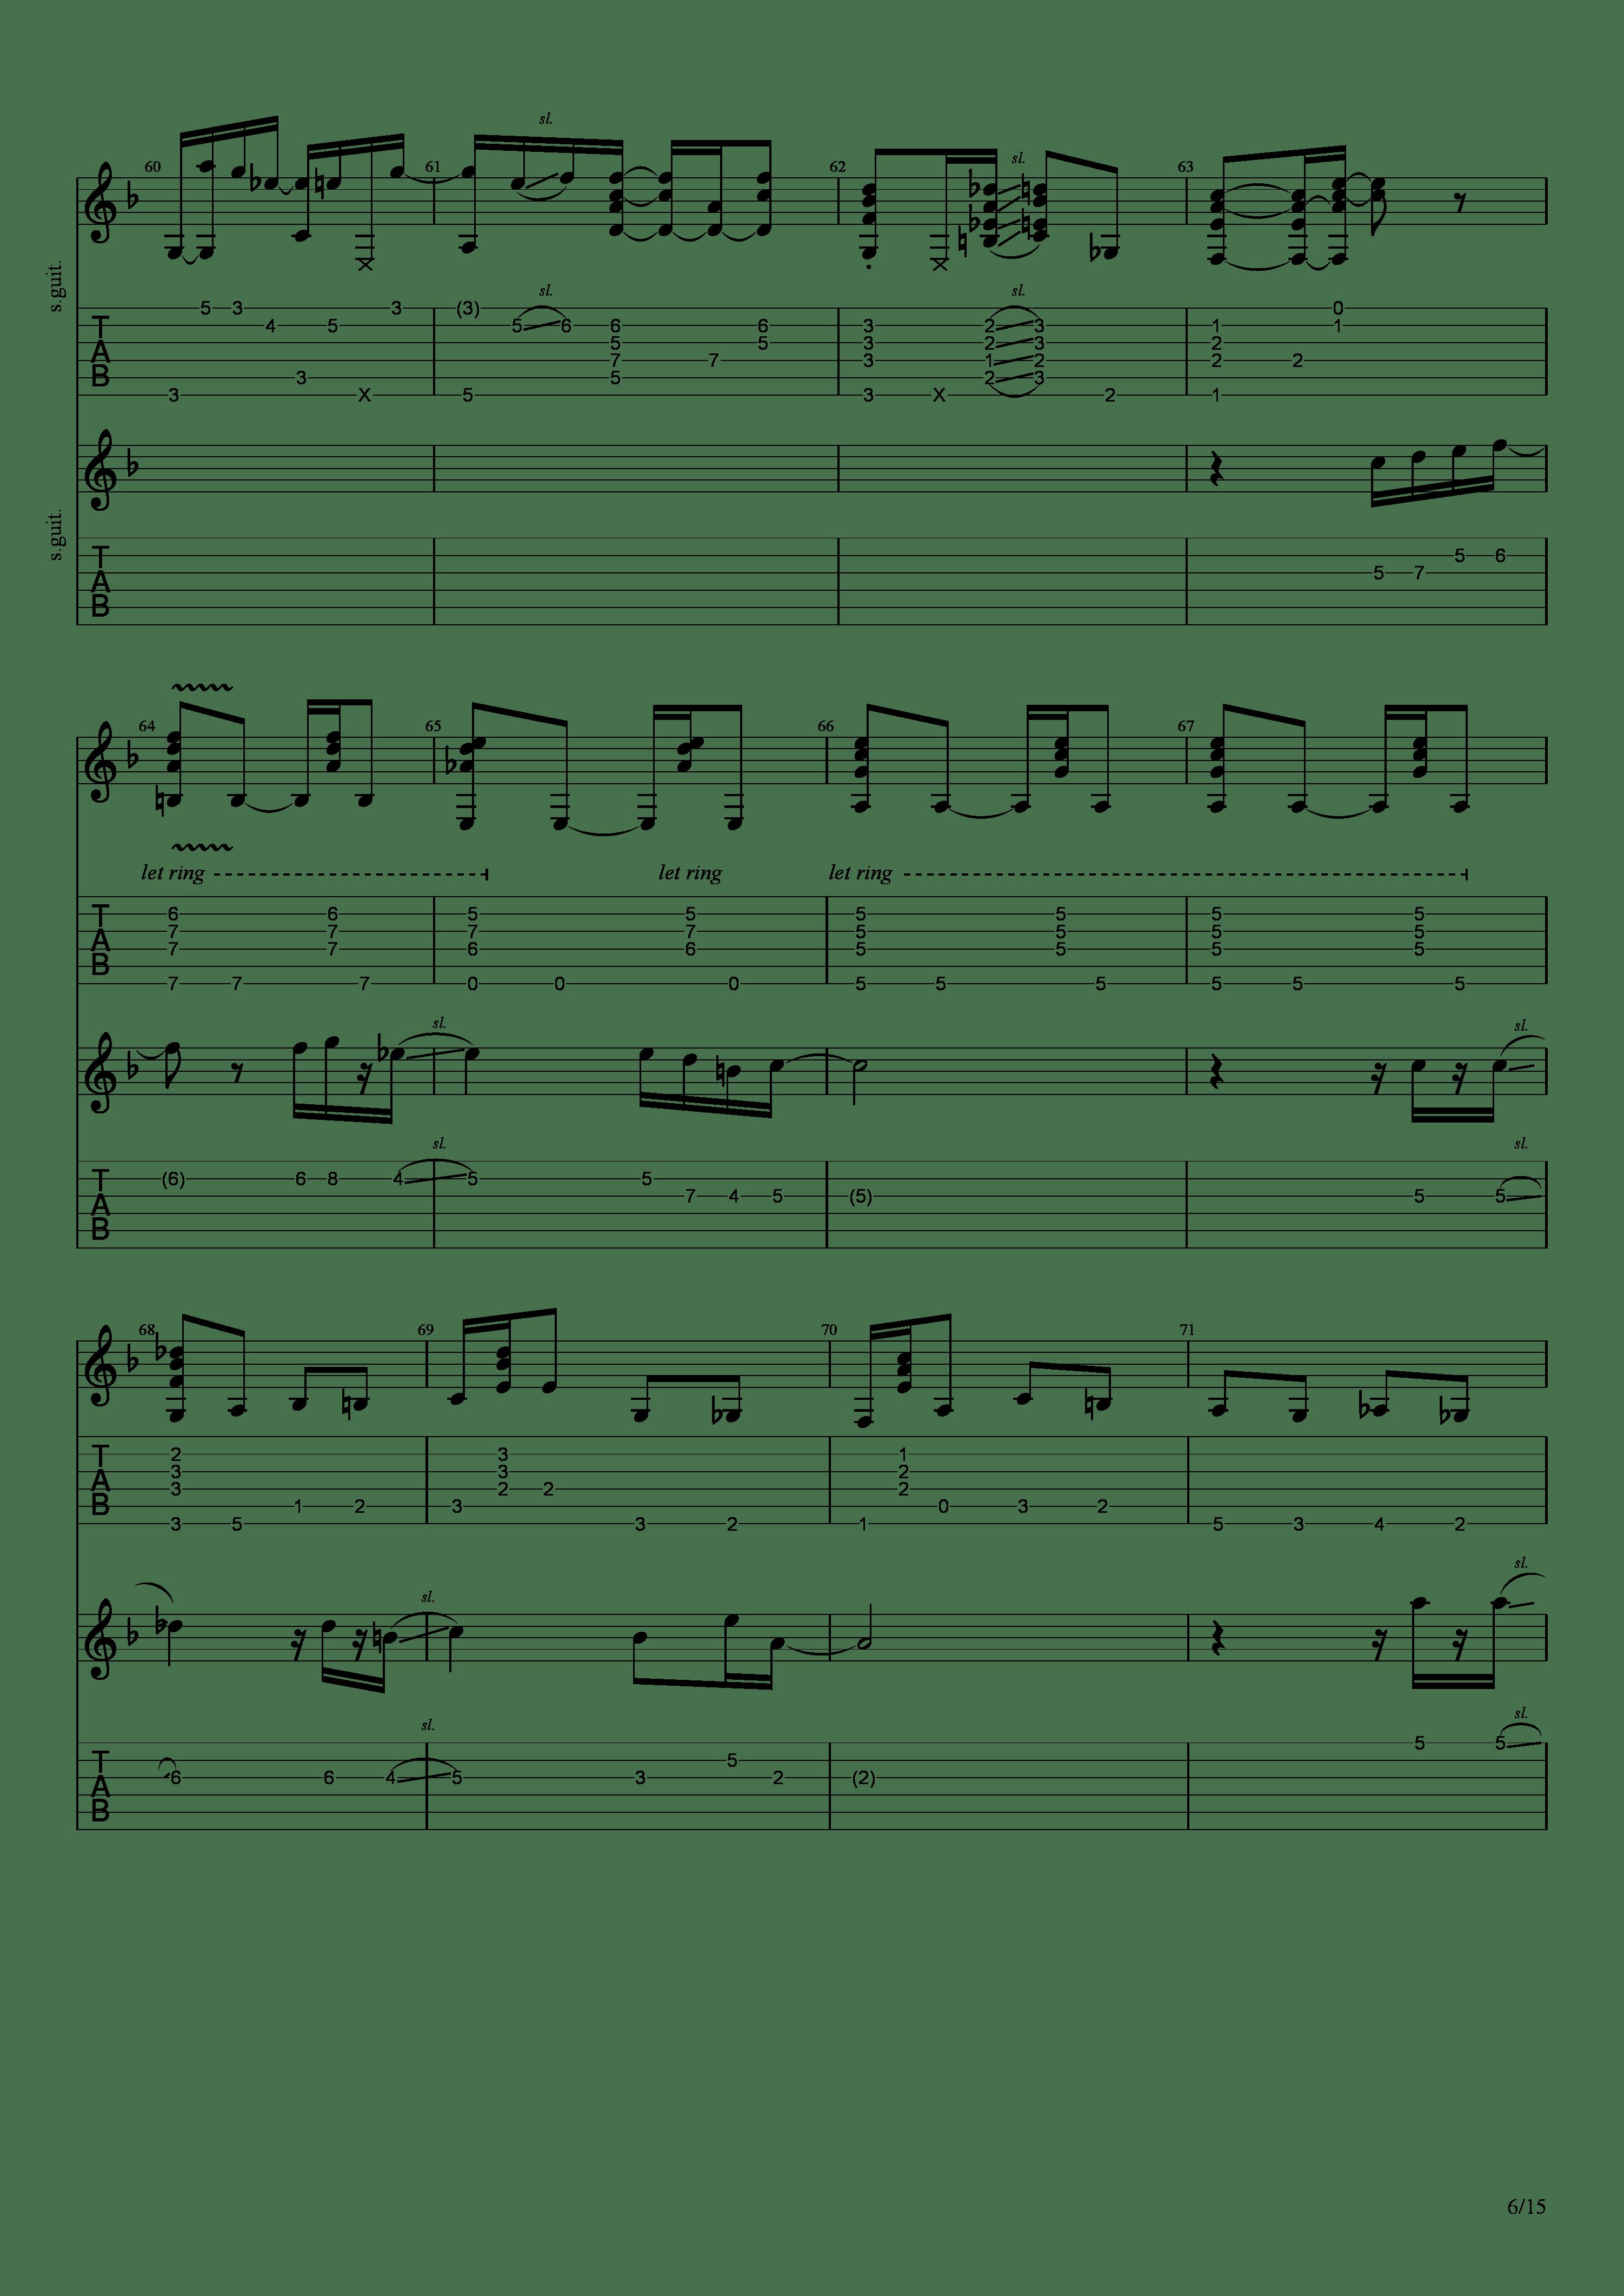 Labyrinth (松井佑贵&井草圣二)吉他谱6